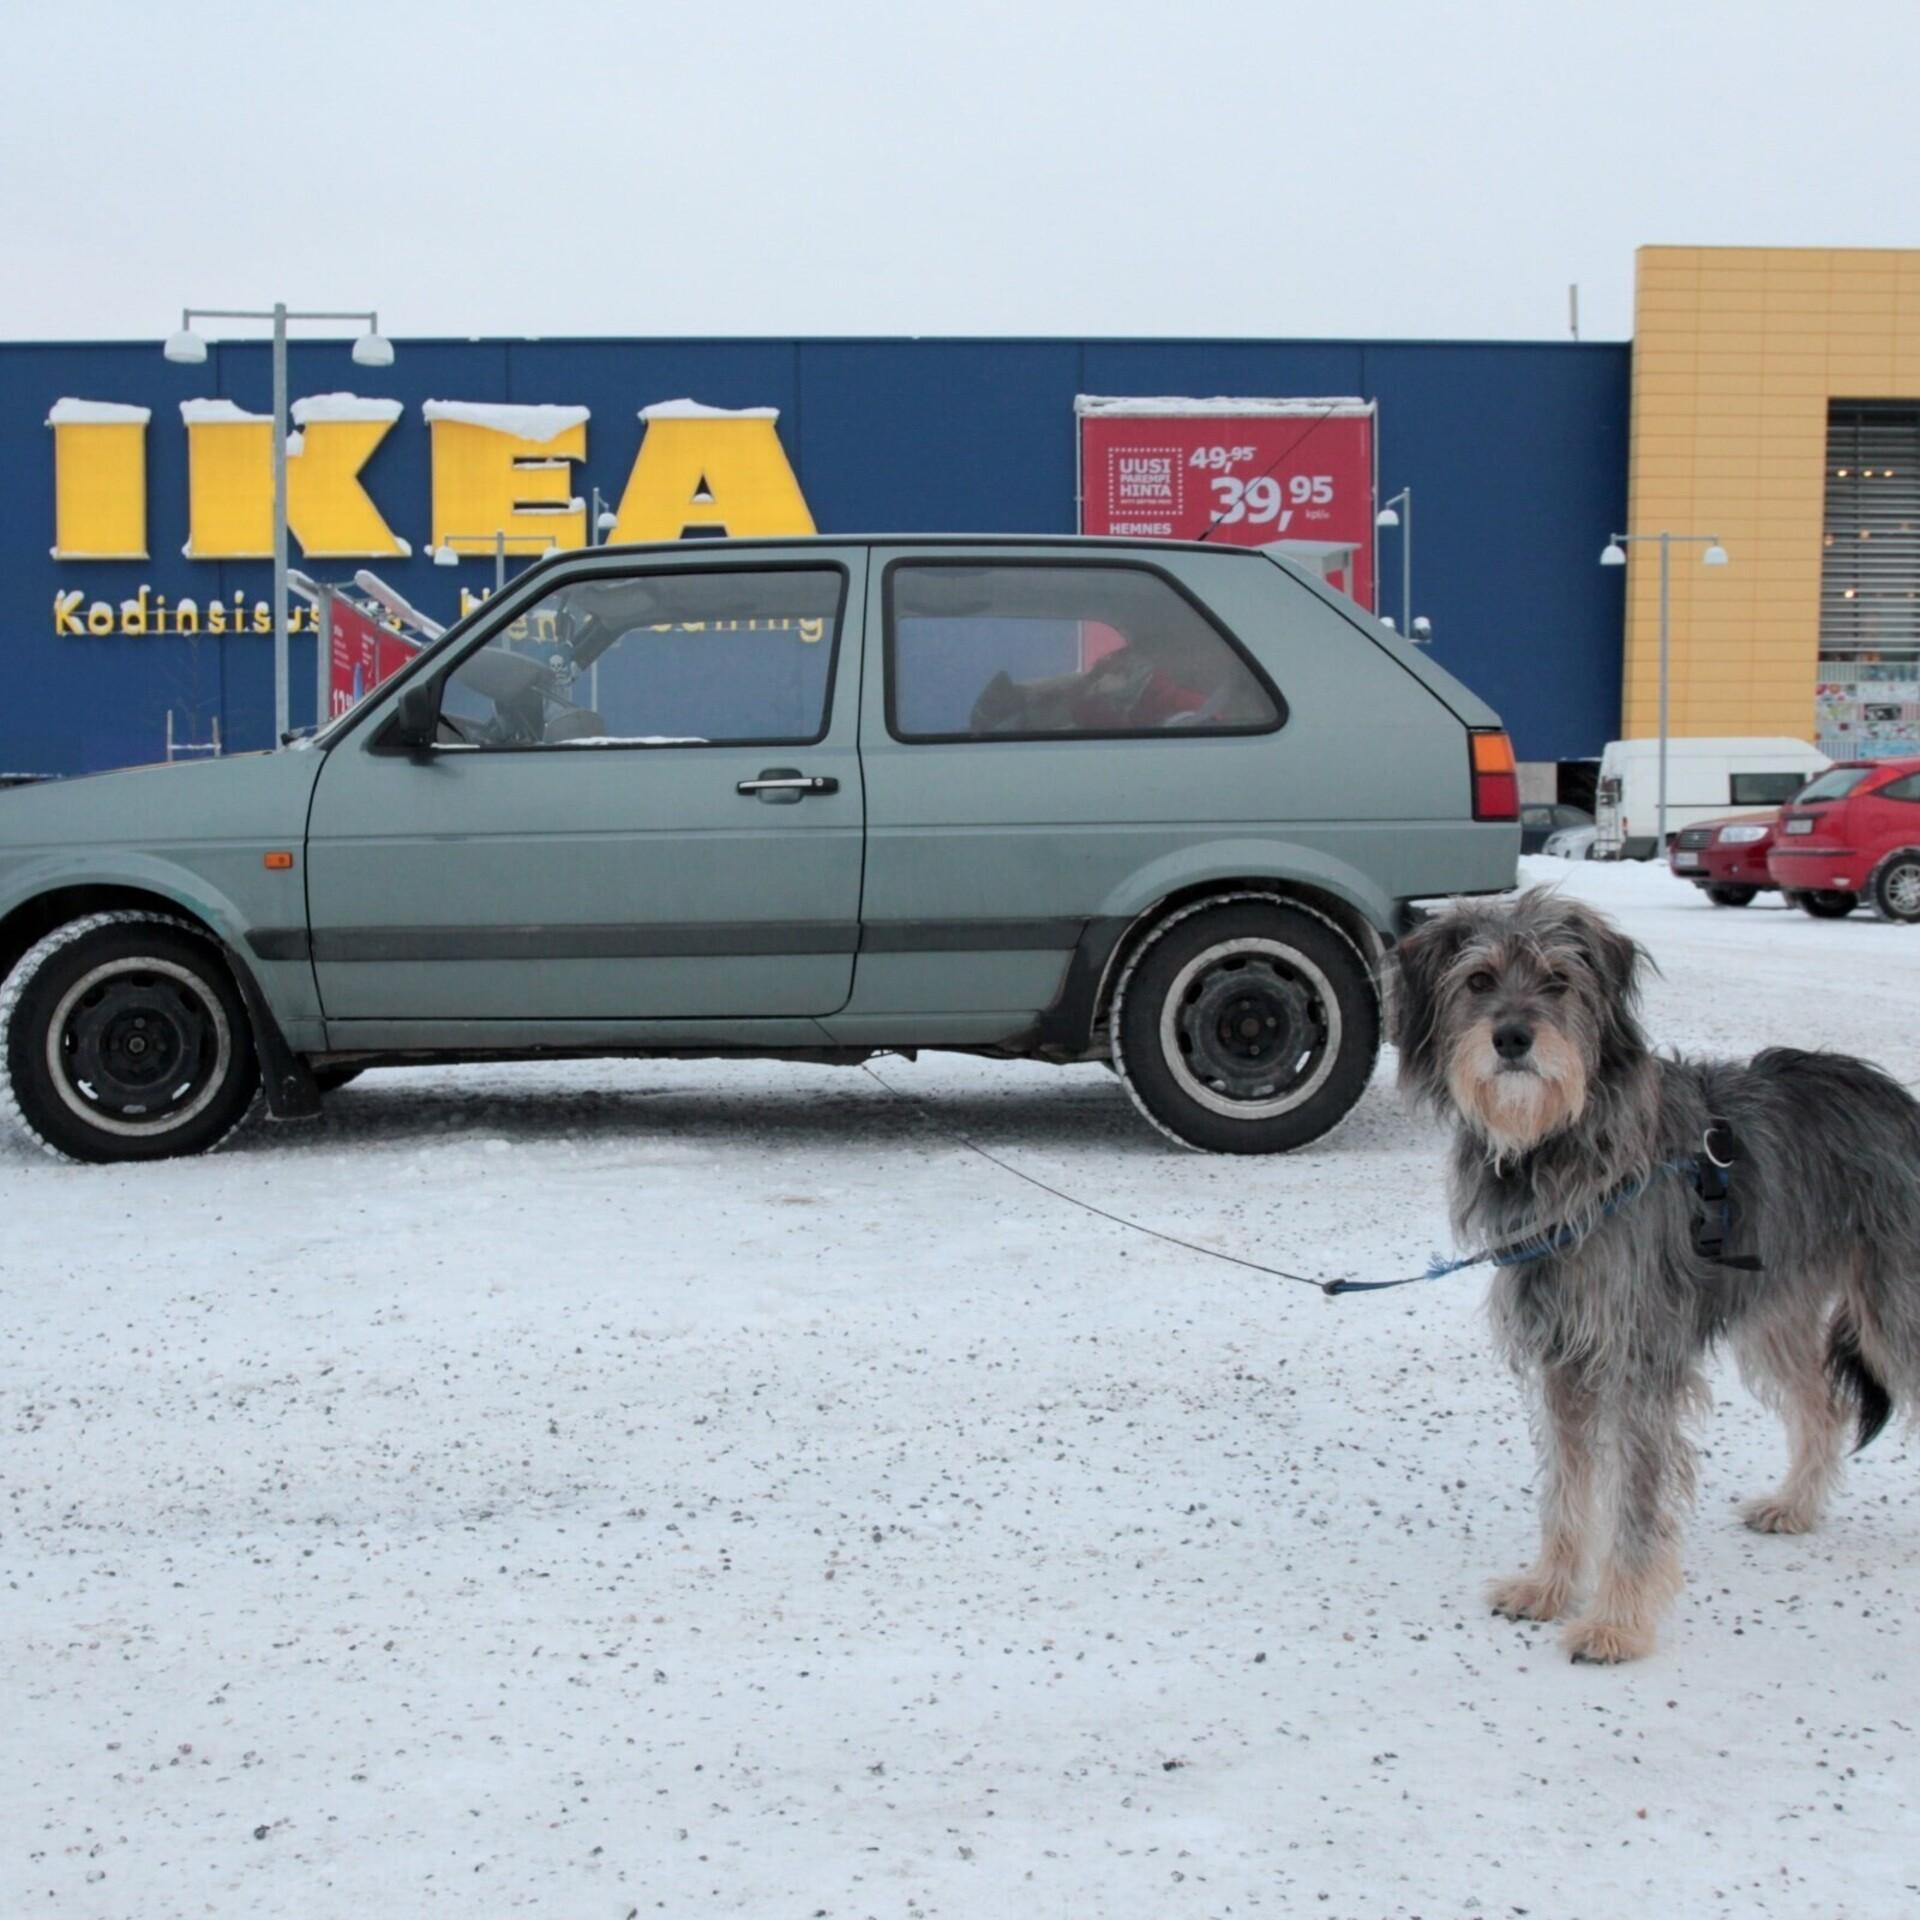 Ikea To Open Future Store In Tallinn Economy Err